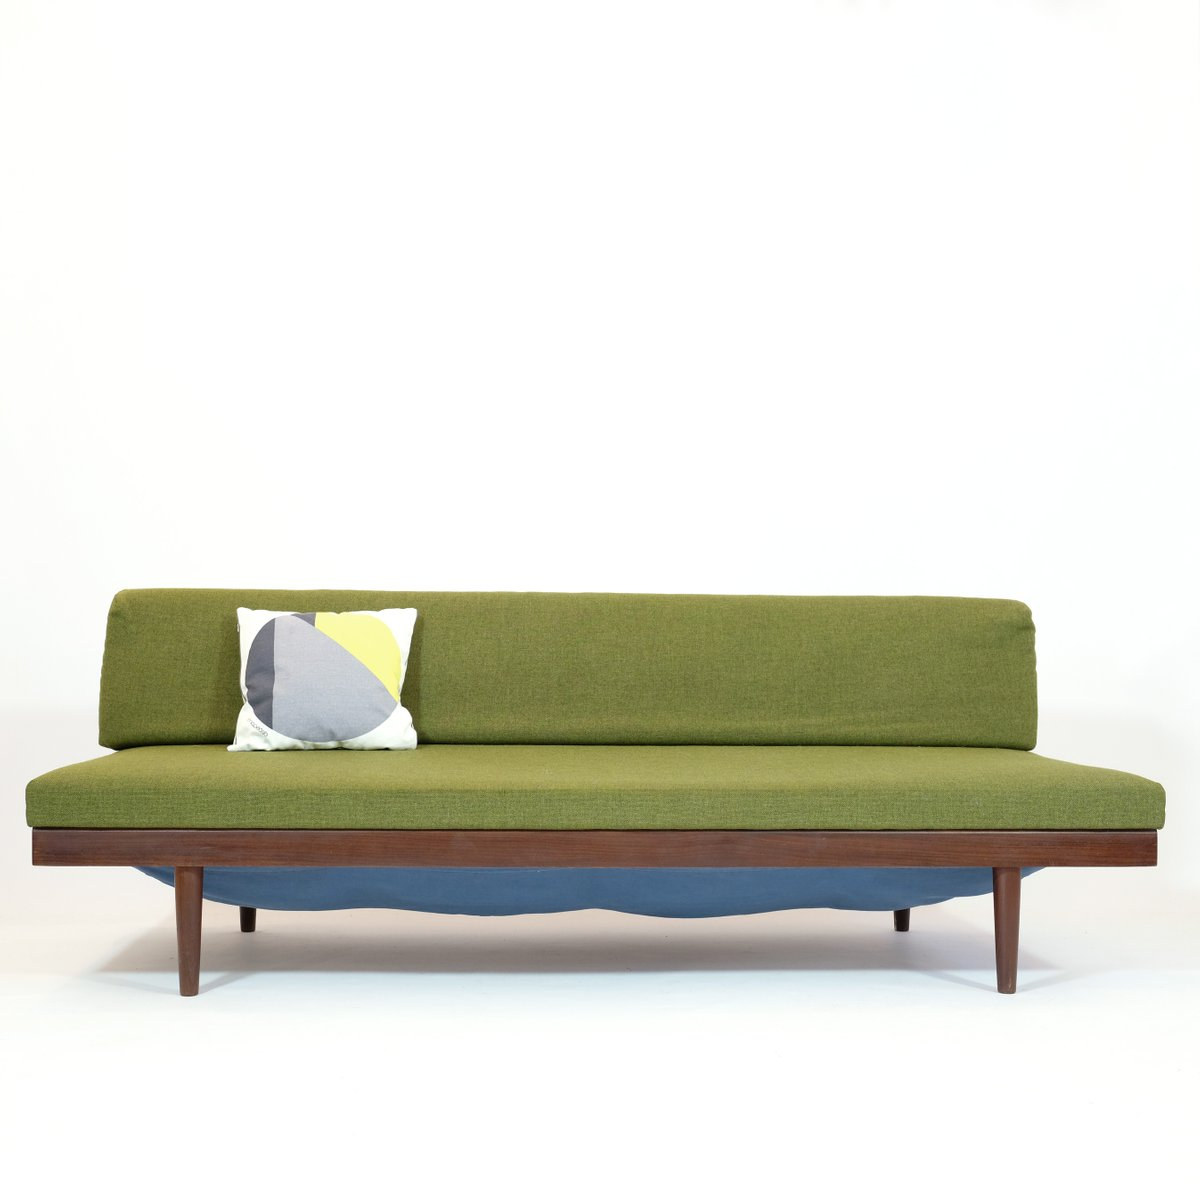 Skandinavisches 3-Sitzer Sofa, 1960er bei Pamono kaufen